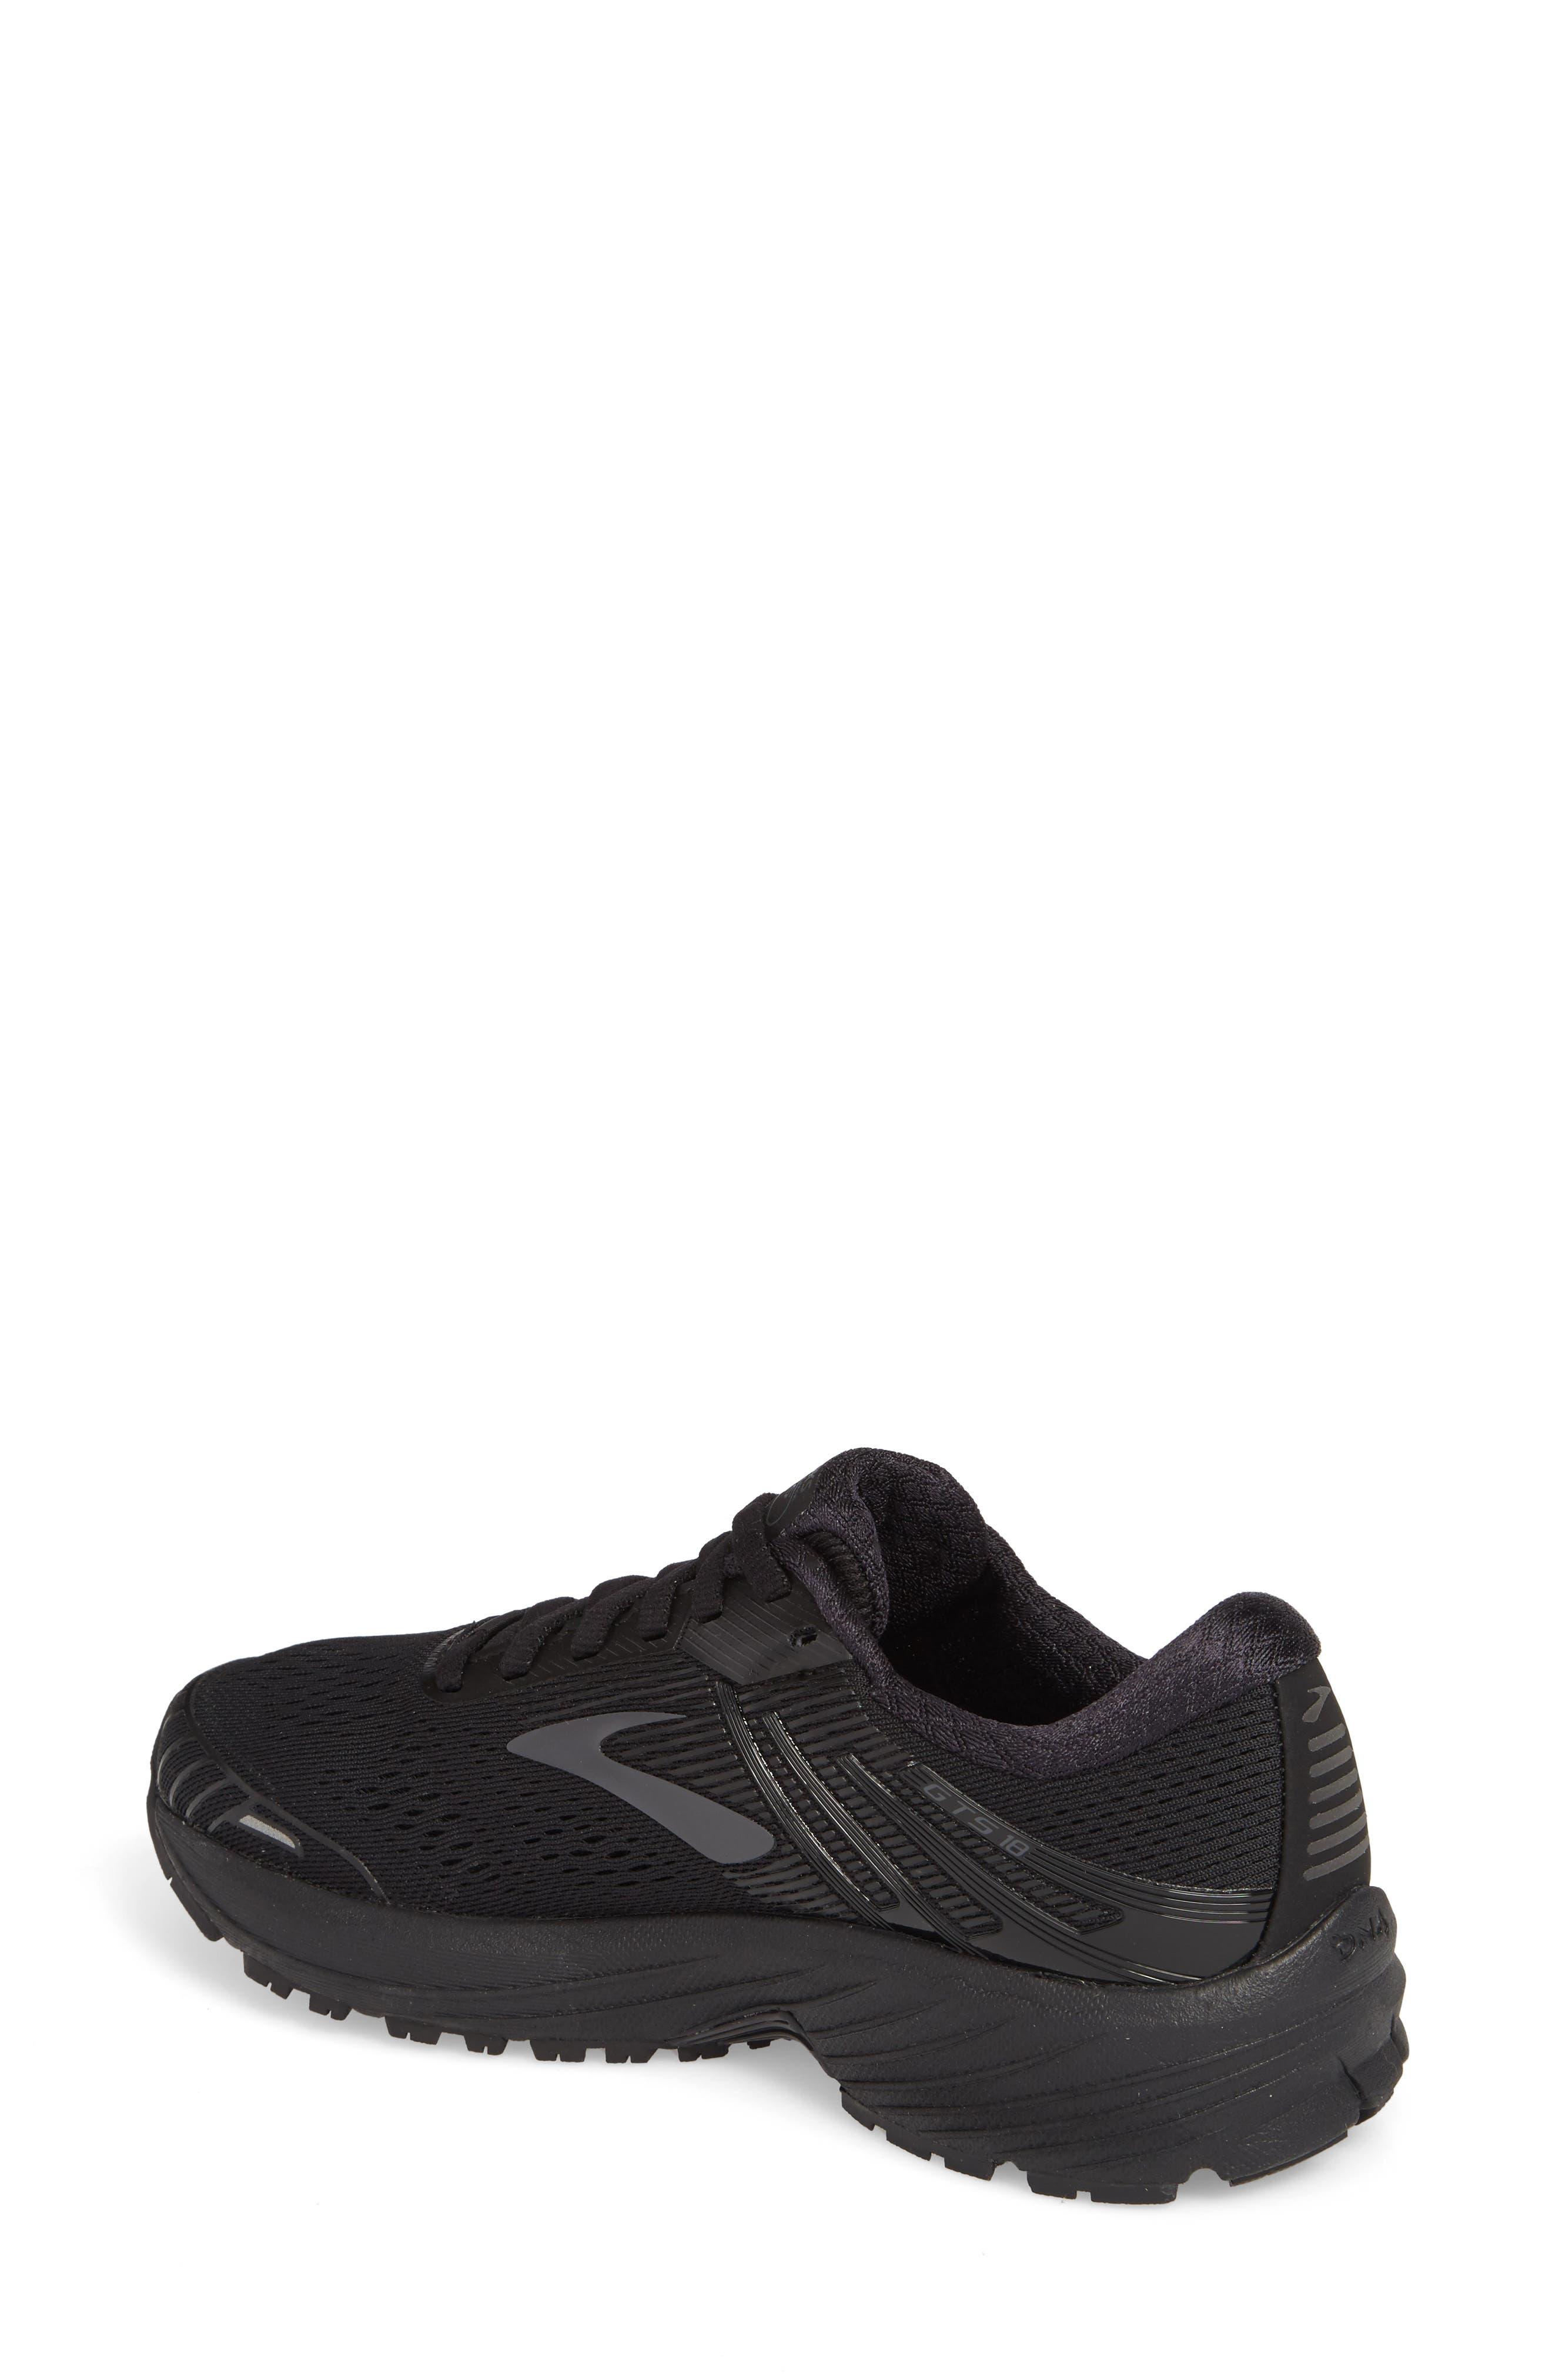 Adrenaline GTS 18 Running Shoe,                             Alternate thumbnail 2, color,                             BLACK/ BLACK